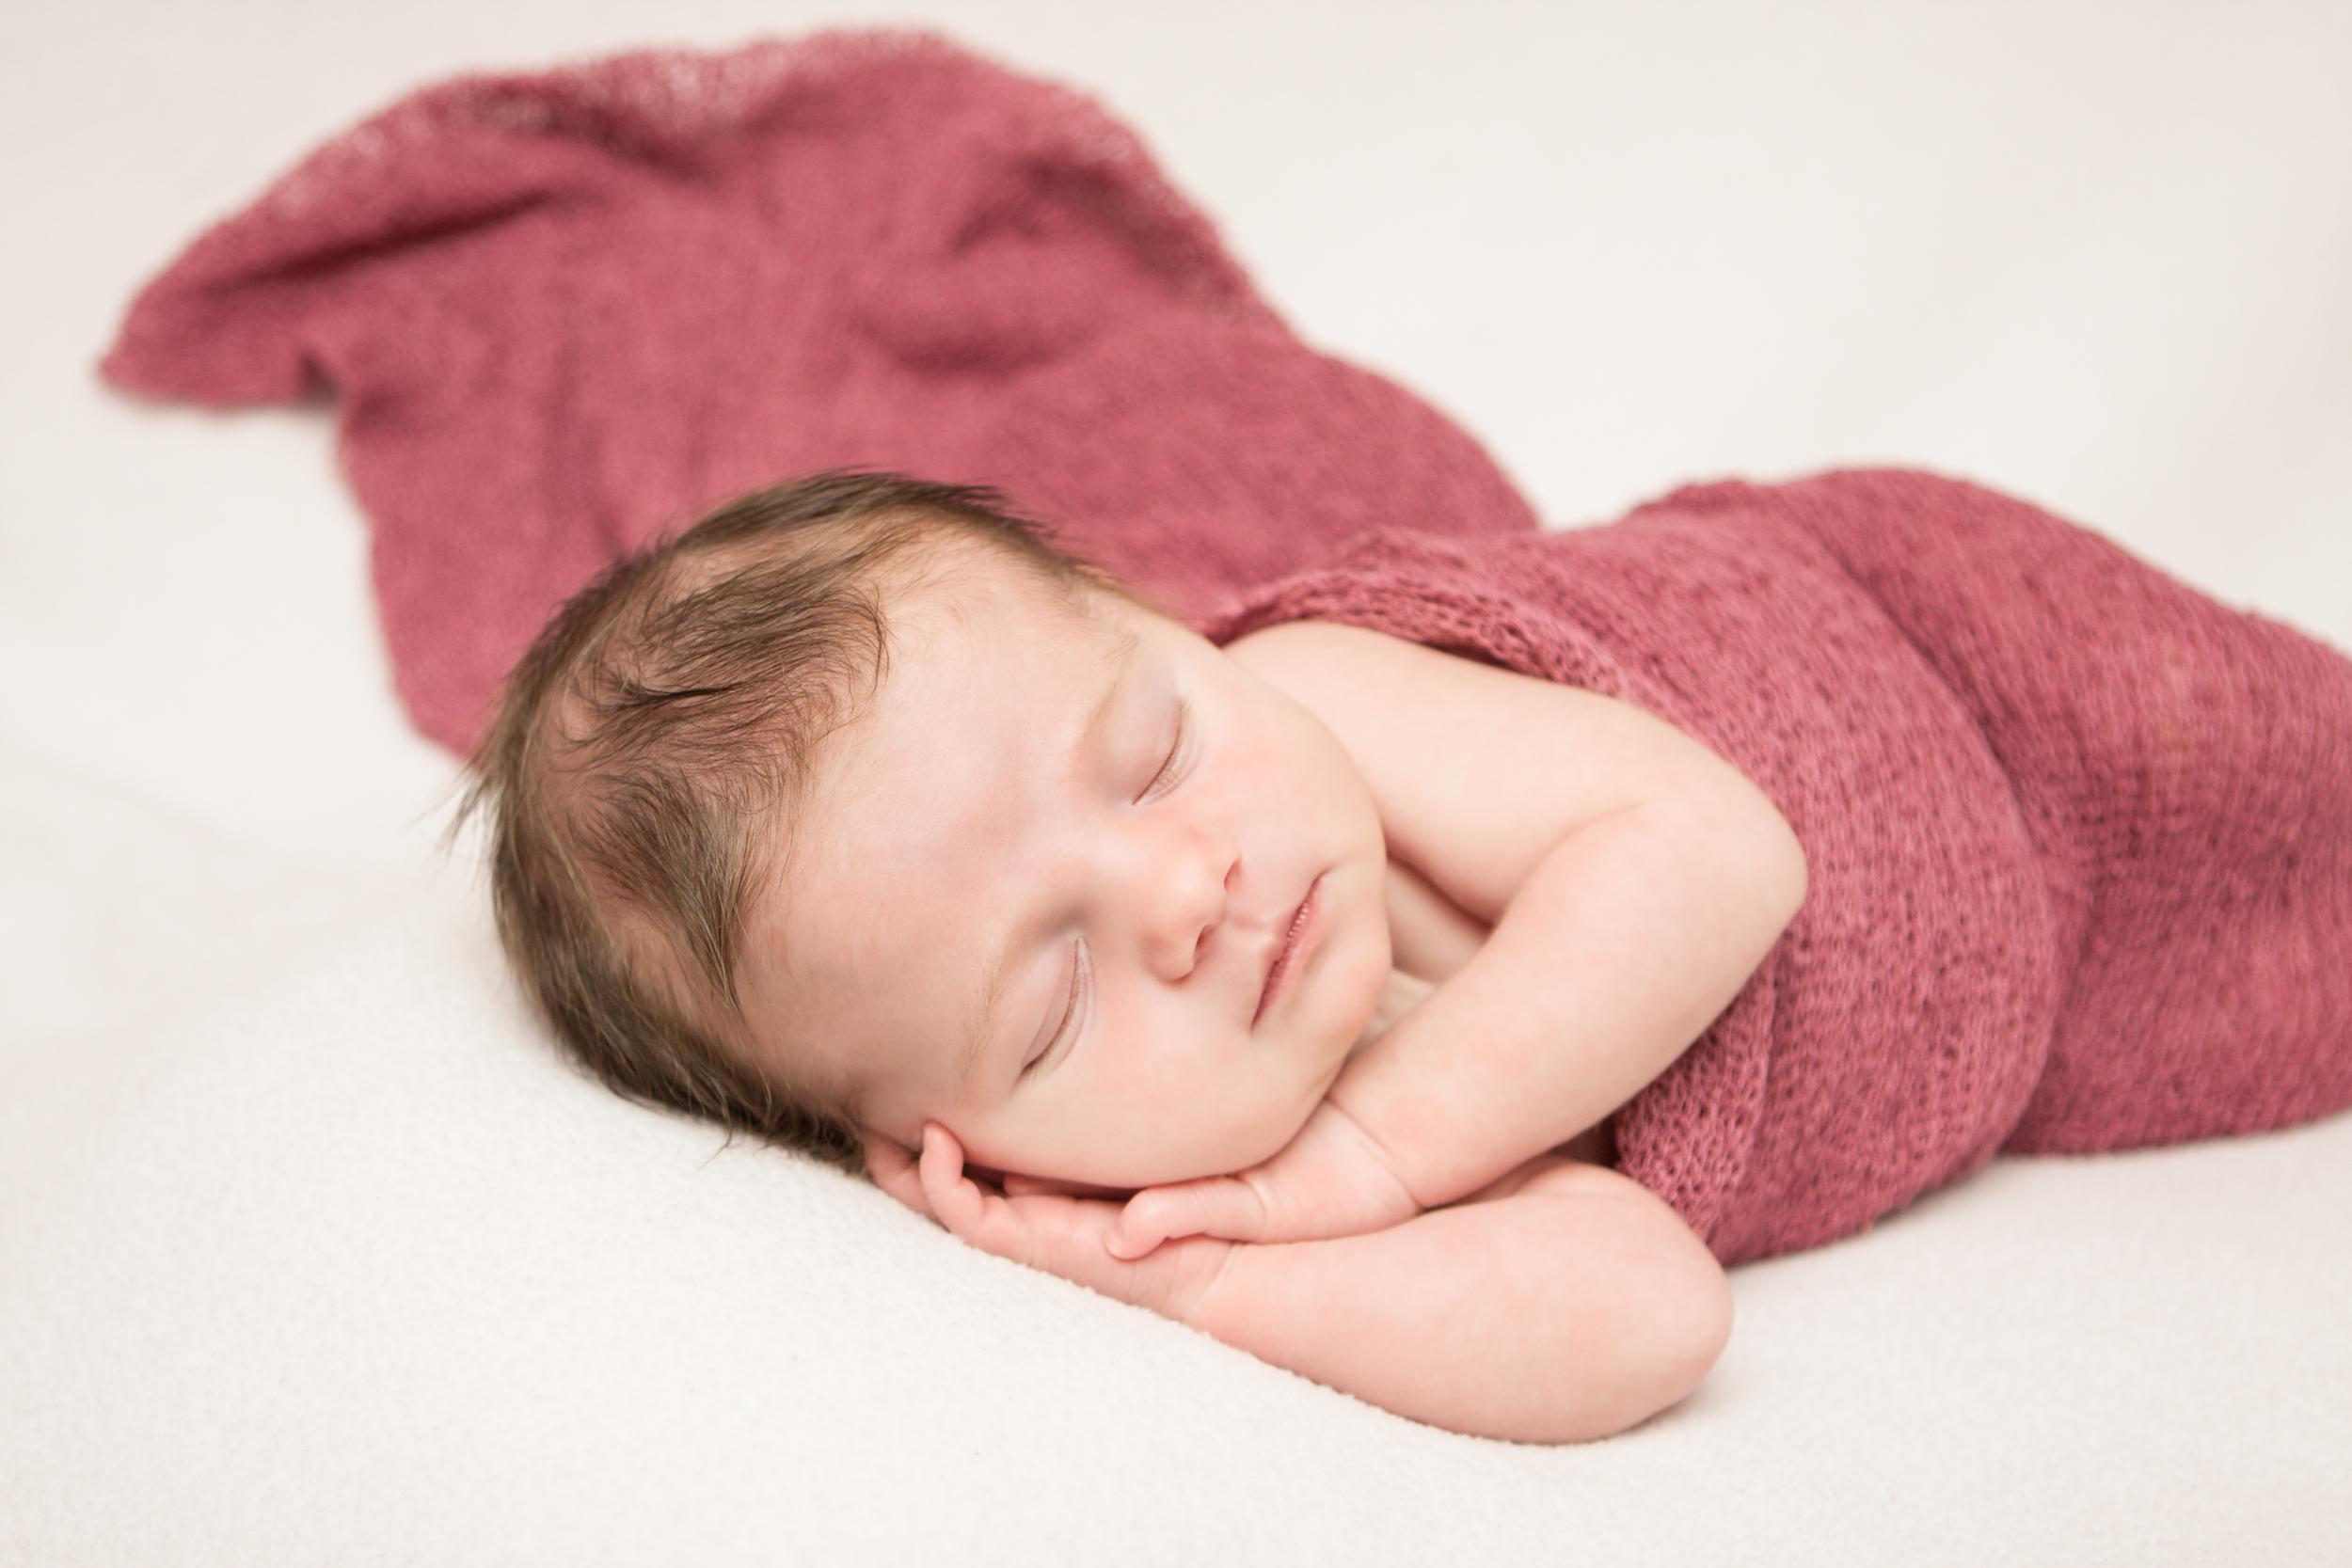 Newborn baby girl, pink berry maroon stretch wrap, on white fabric blanket backdrop, beanbag pose, Westchester County, New York Newborn Photographer, Amanda Noelle Photography.